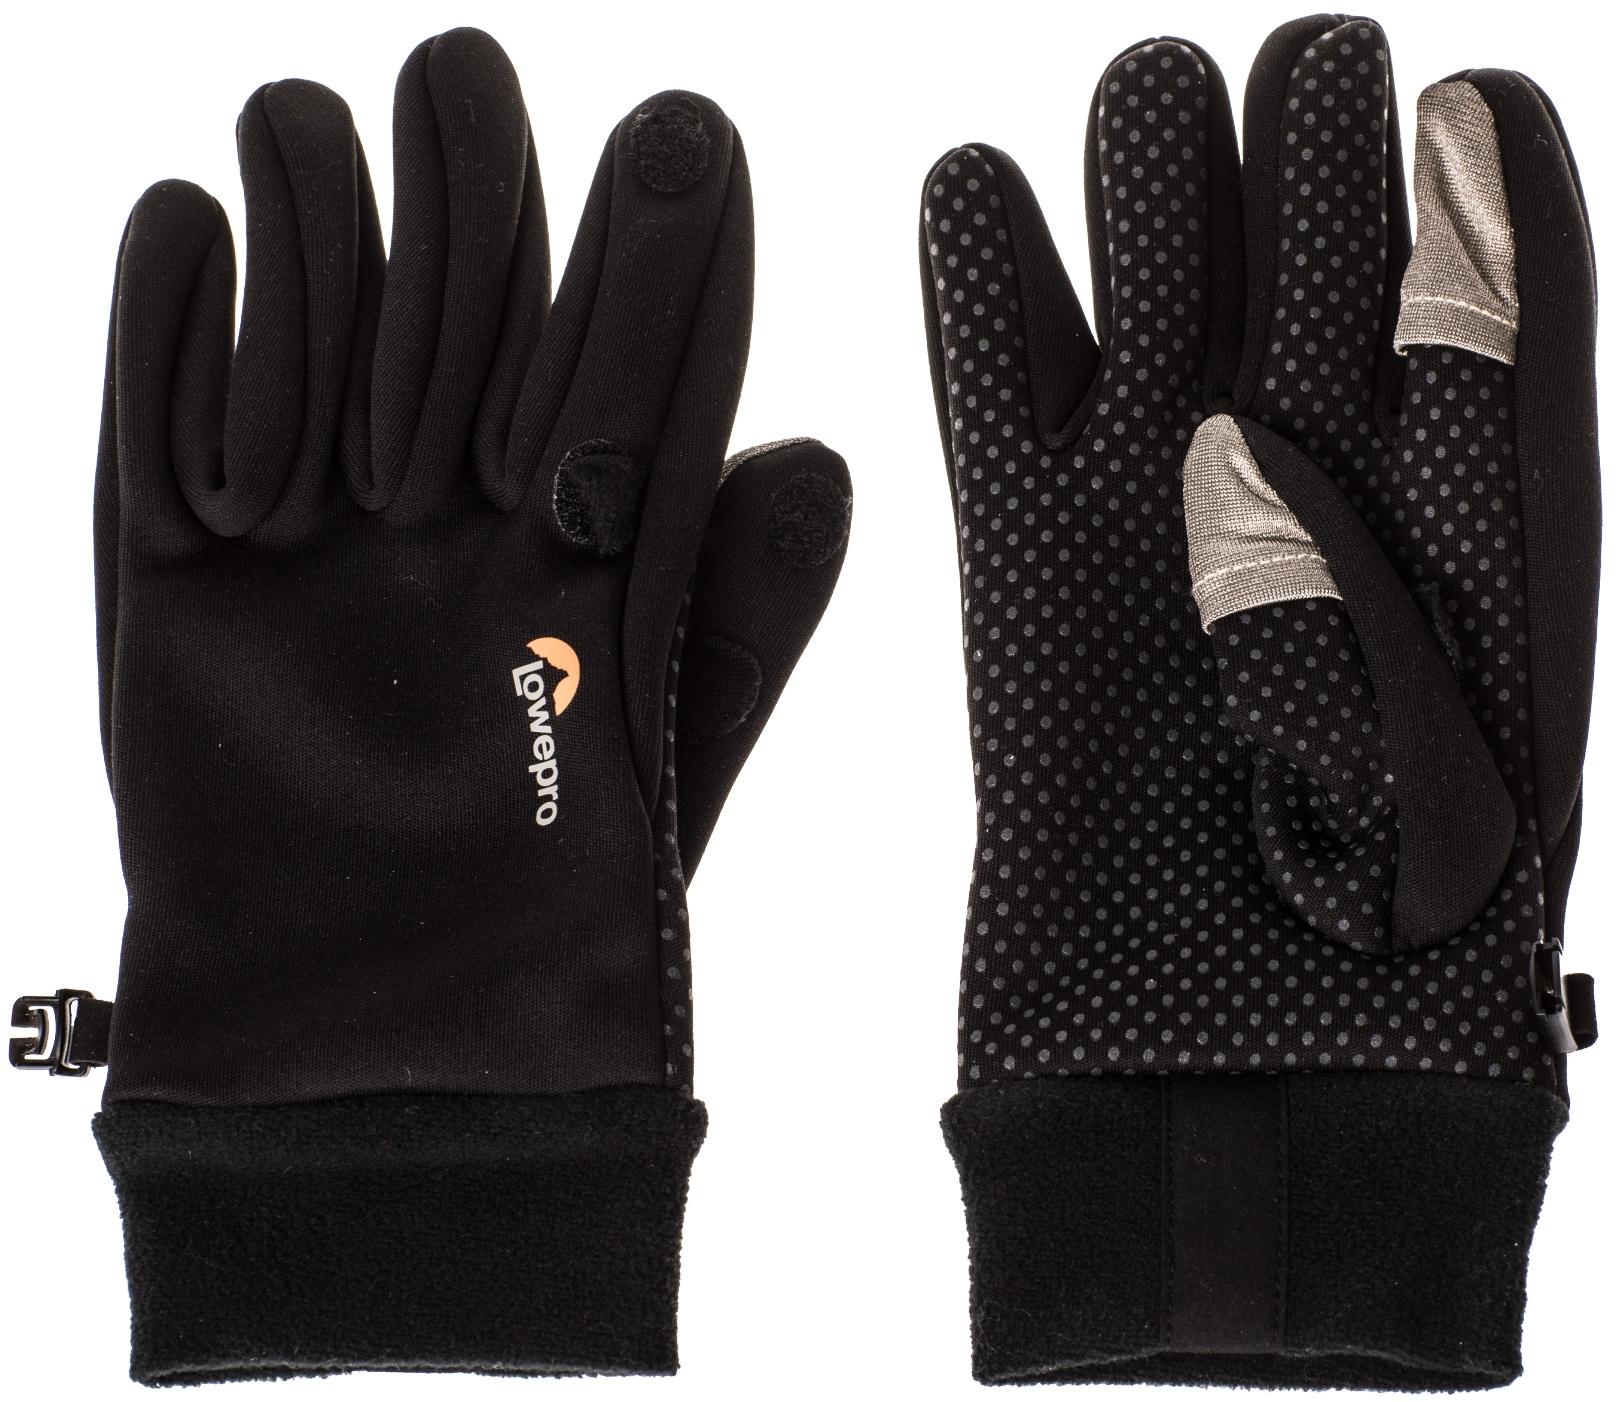 LOWEPRO Photo Gloves S rukavice